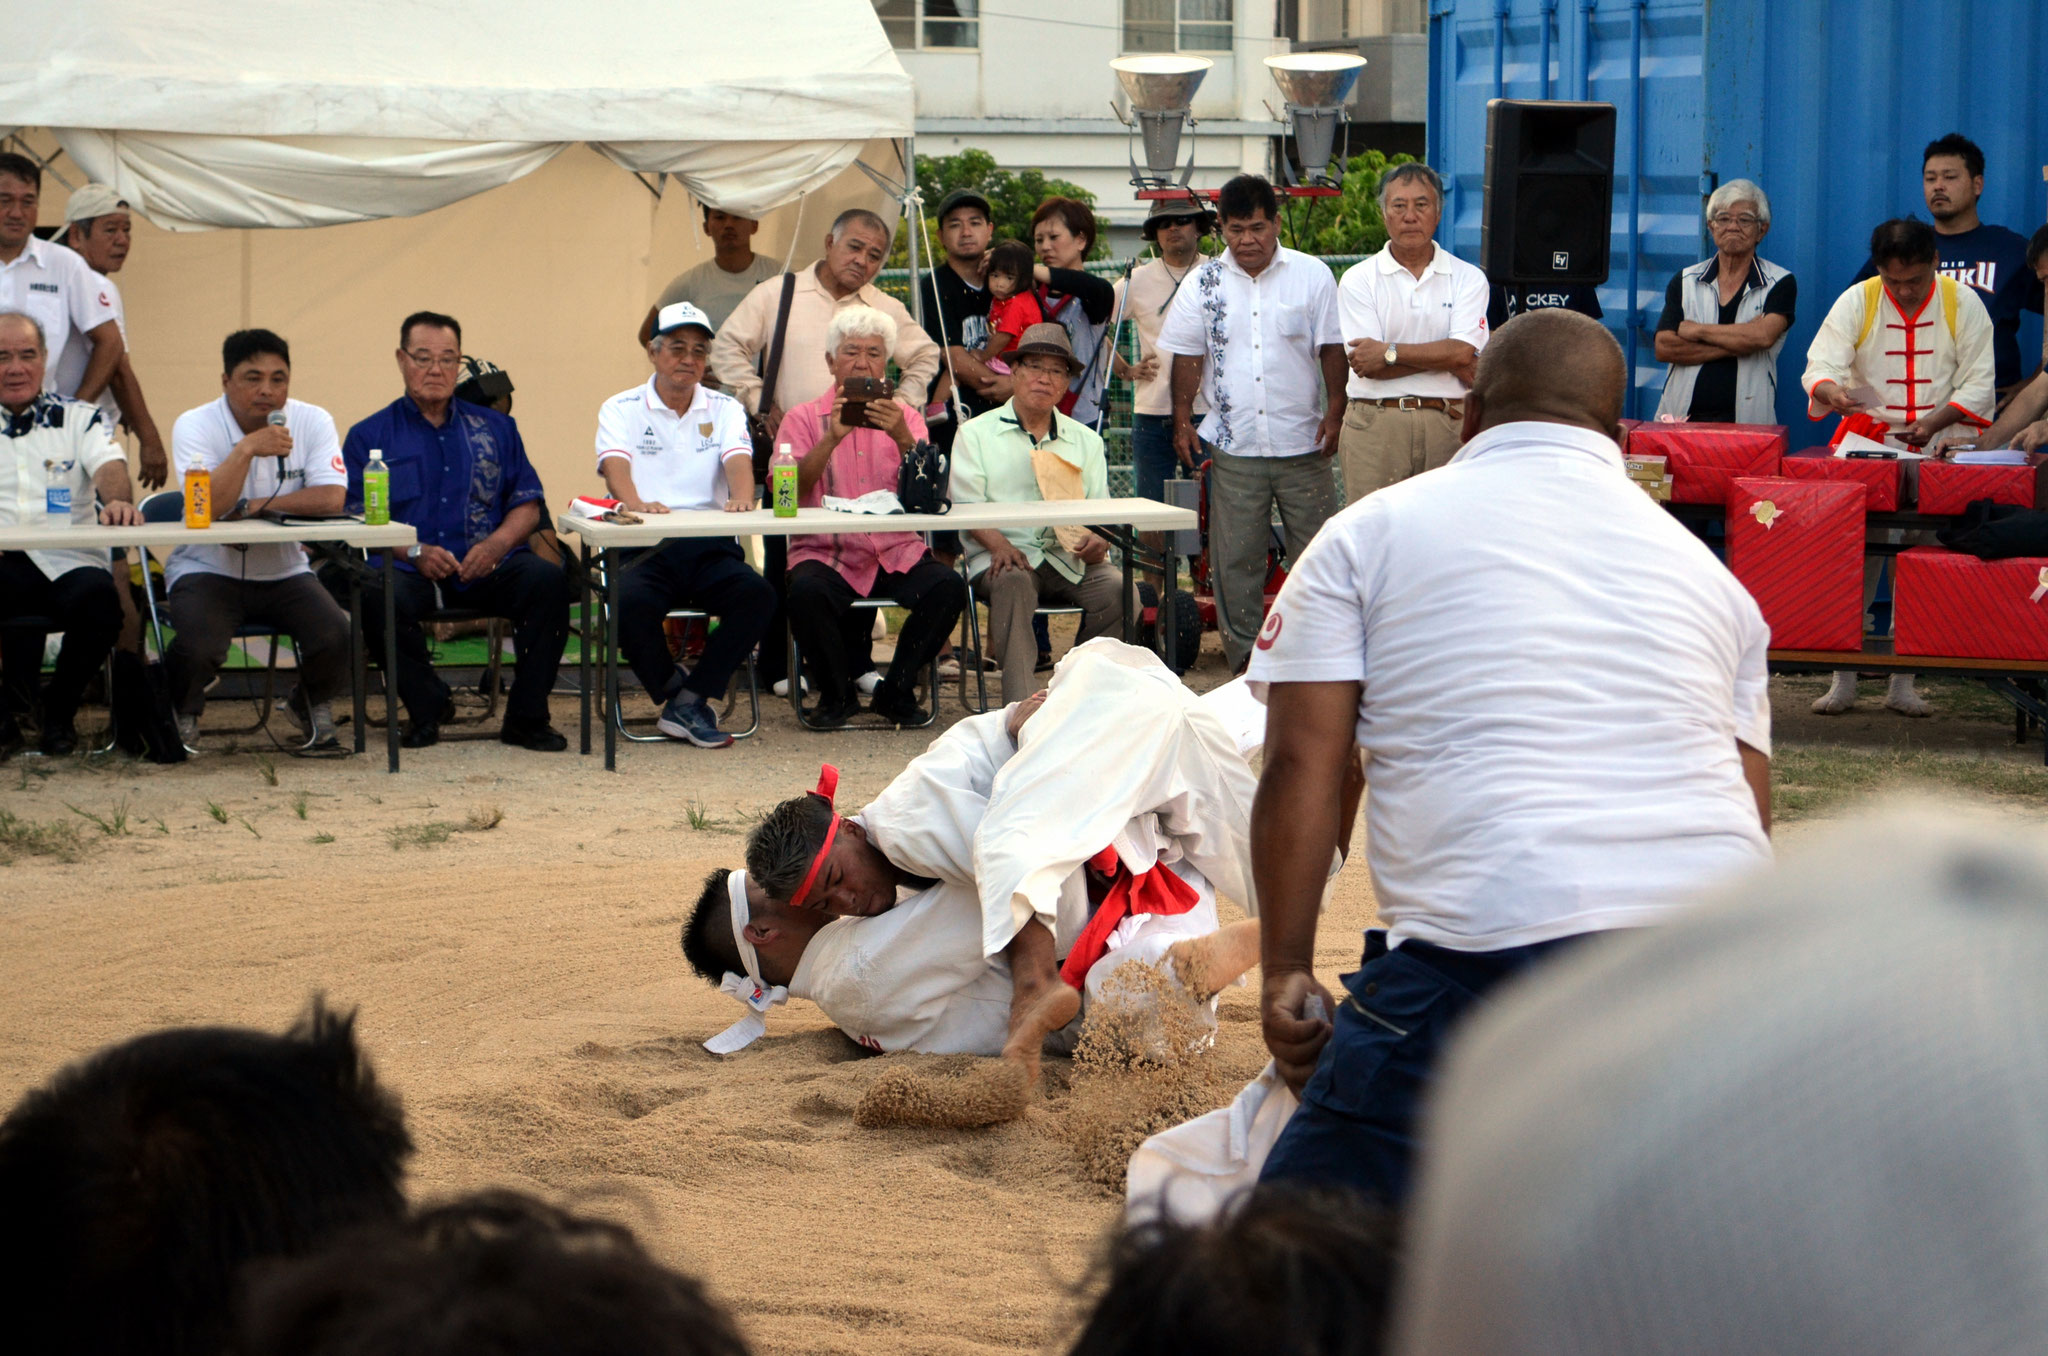 Okinawa Sumo